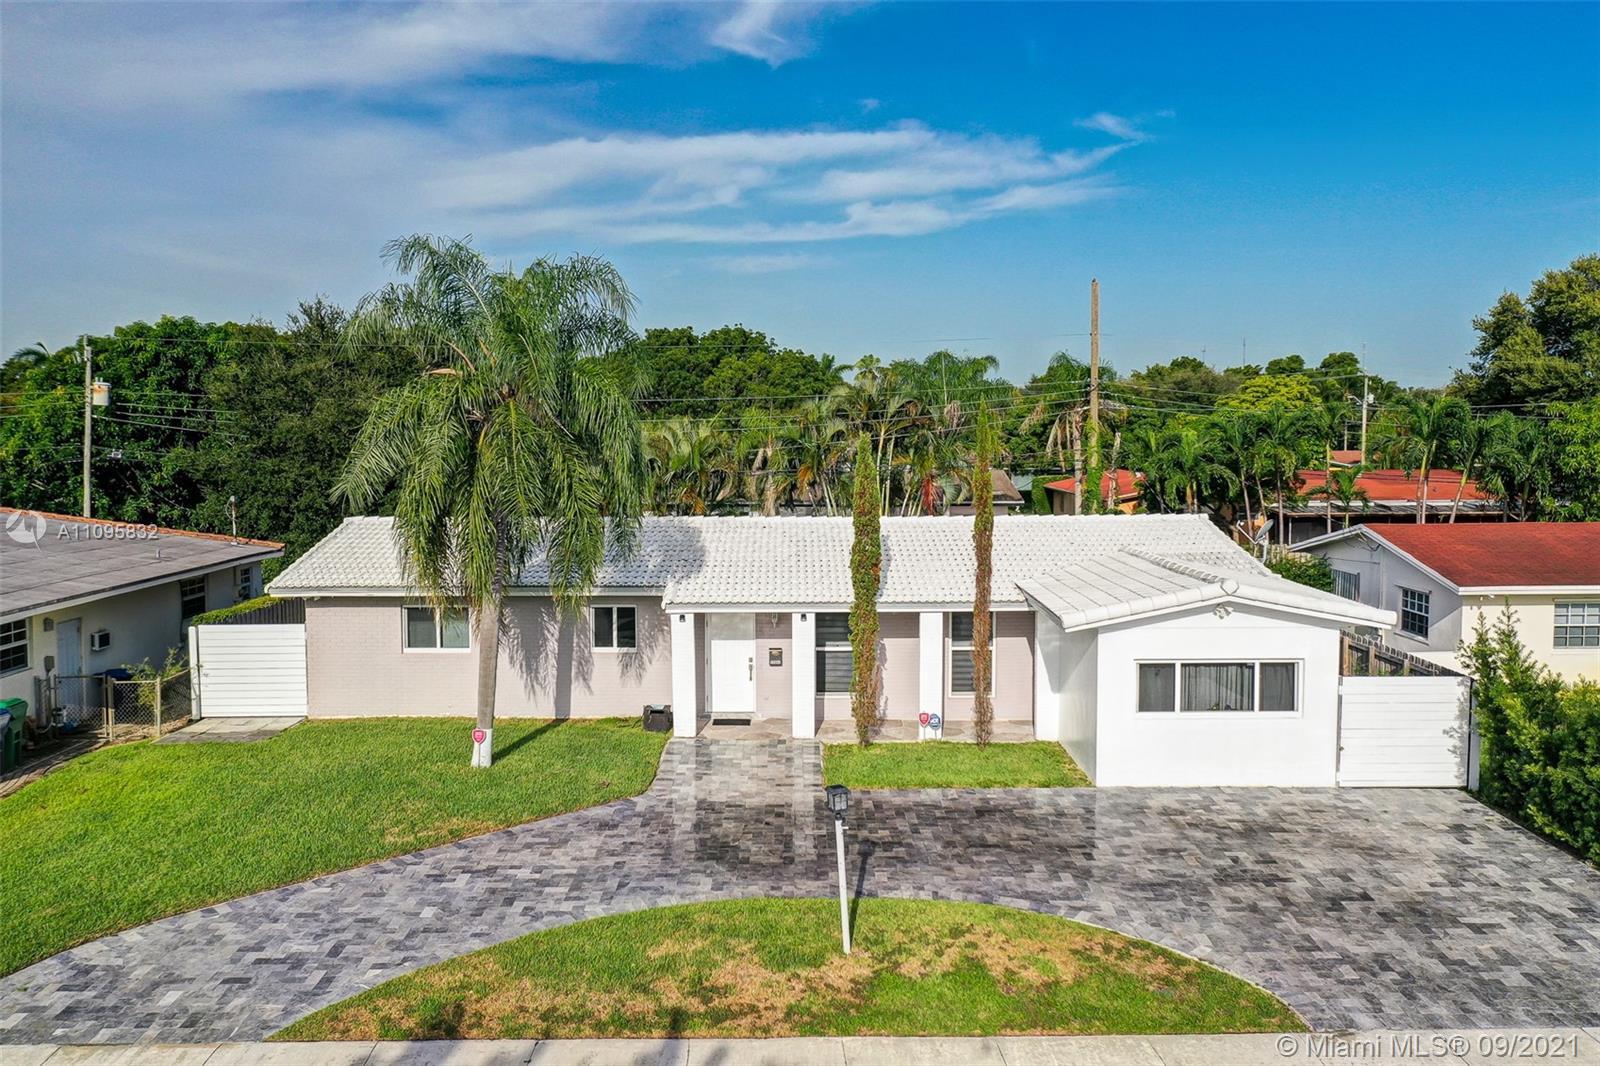 Greyknoll Estates - 19440 NE 18th Pl, Miami, FL 33179